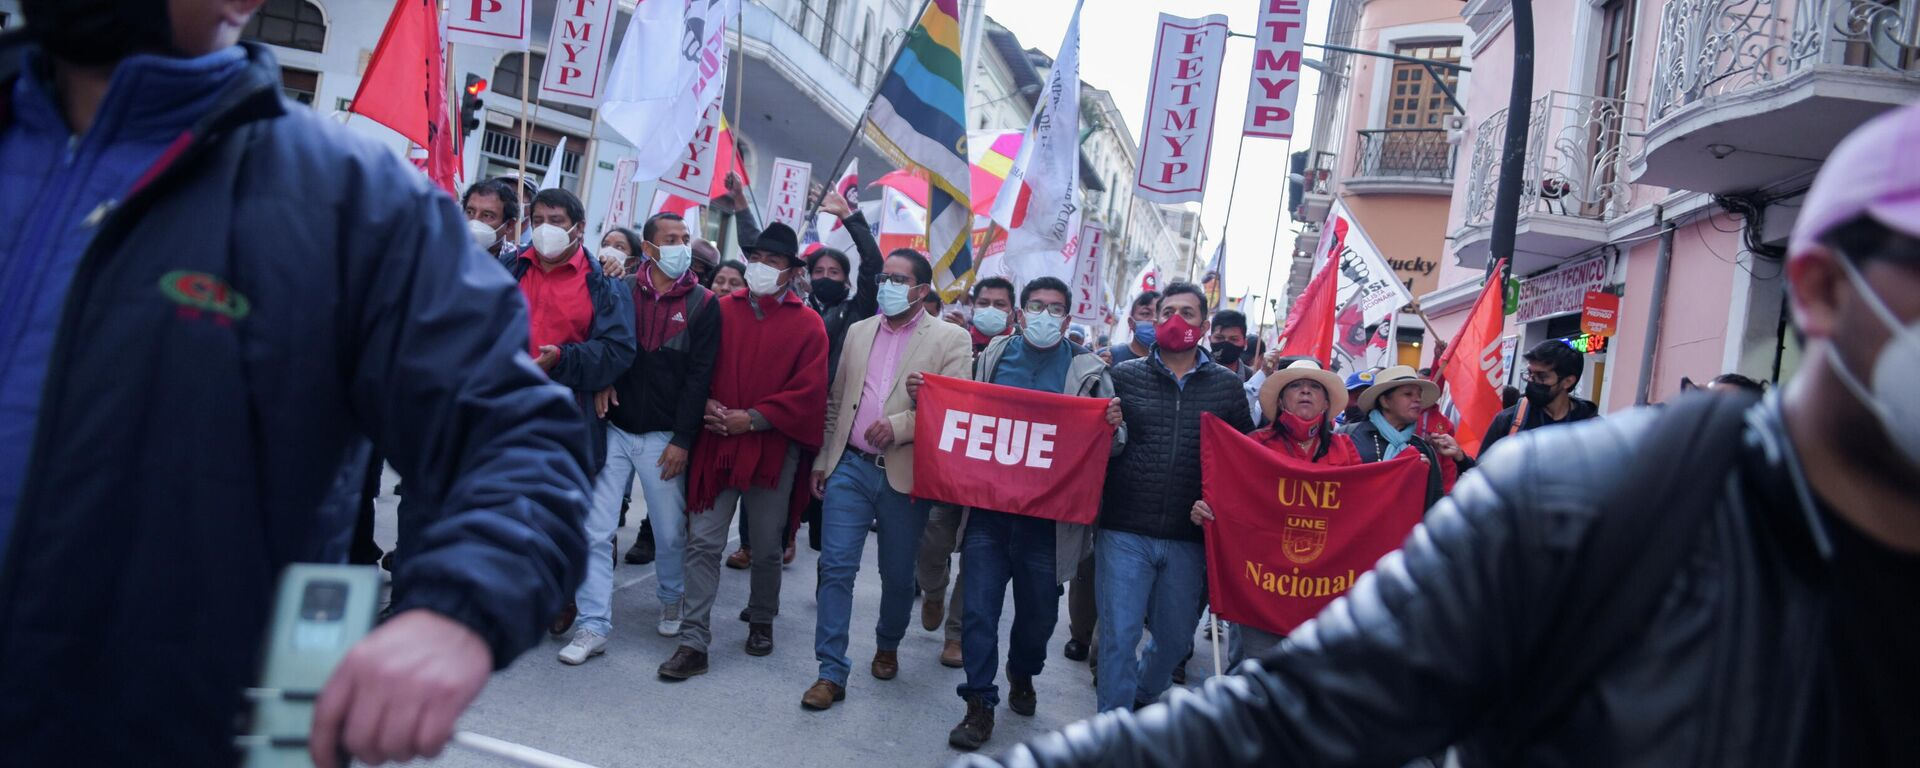 Protestas en Quito, Ecuador - Sputnik Mundo, 1920, 16.09.2021